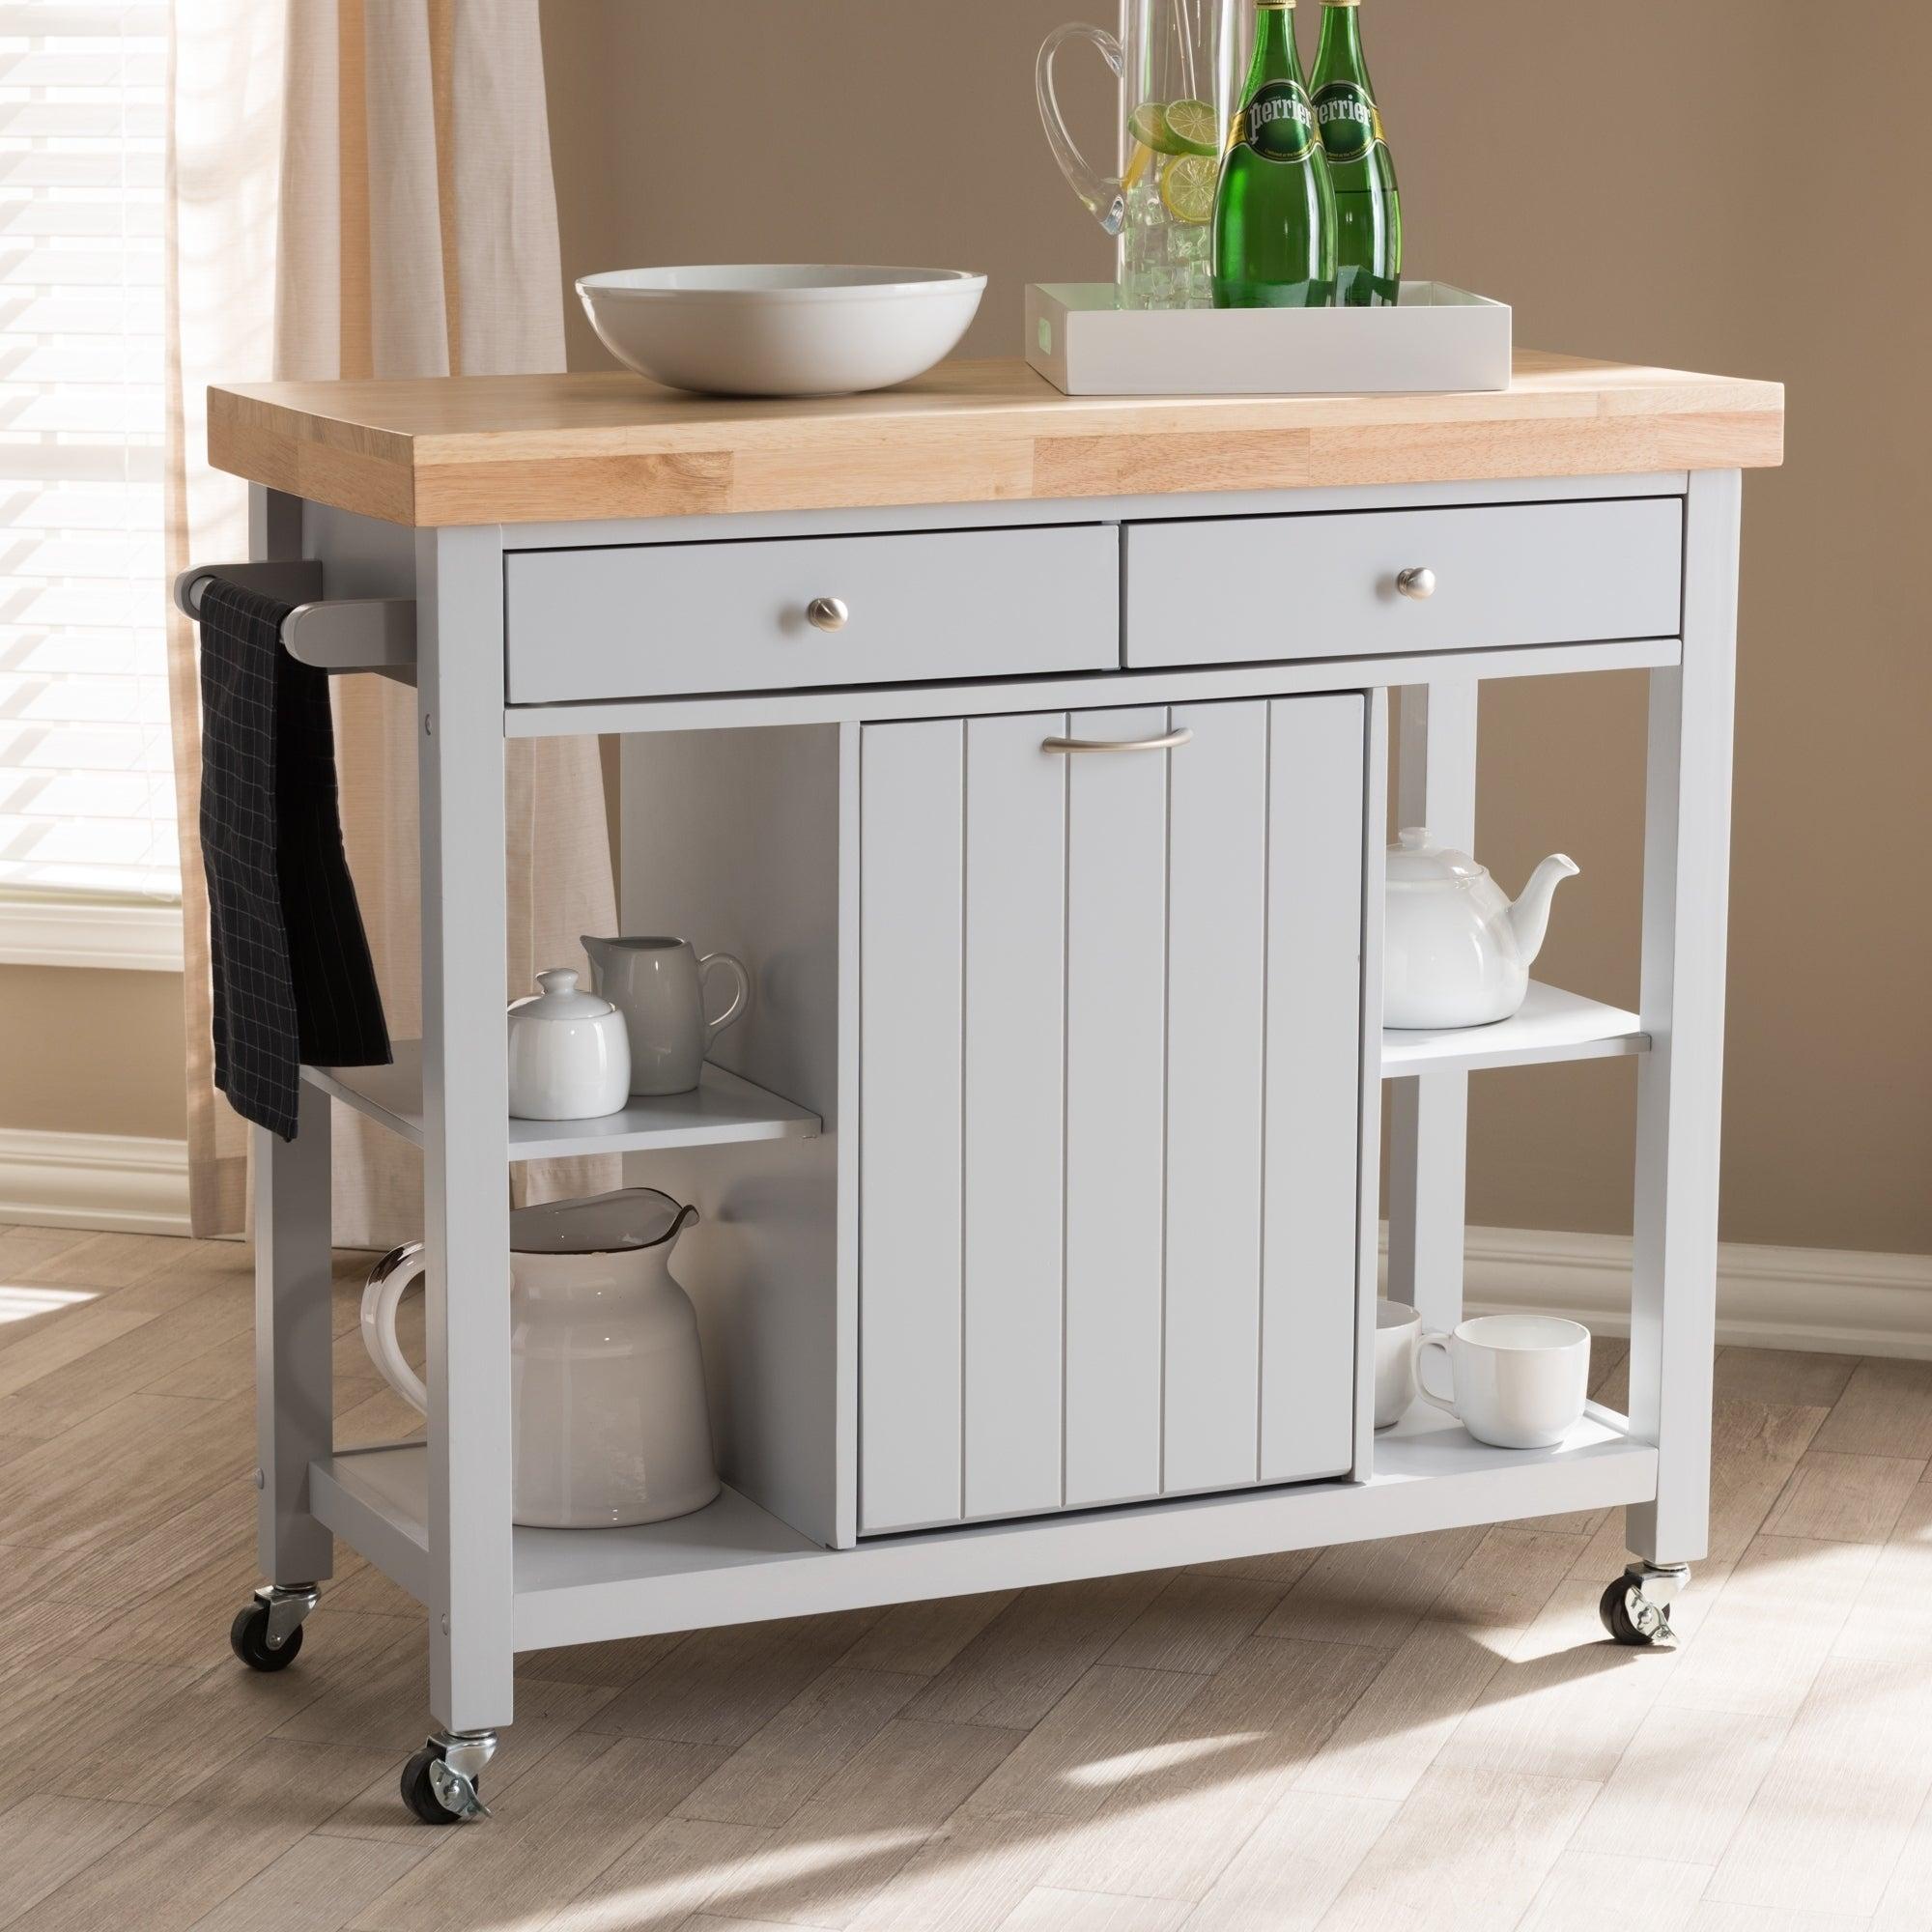 Farmhouse Grey Wood Kitchen Cart by Baxton Studio - Free Shipping ...